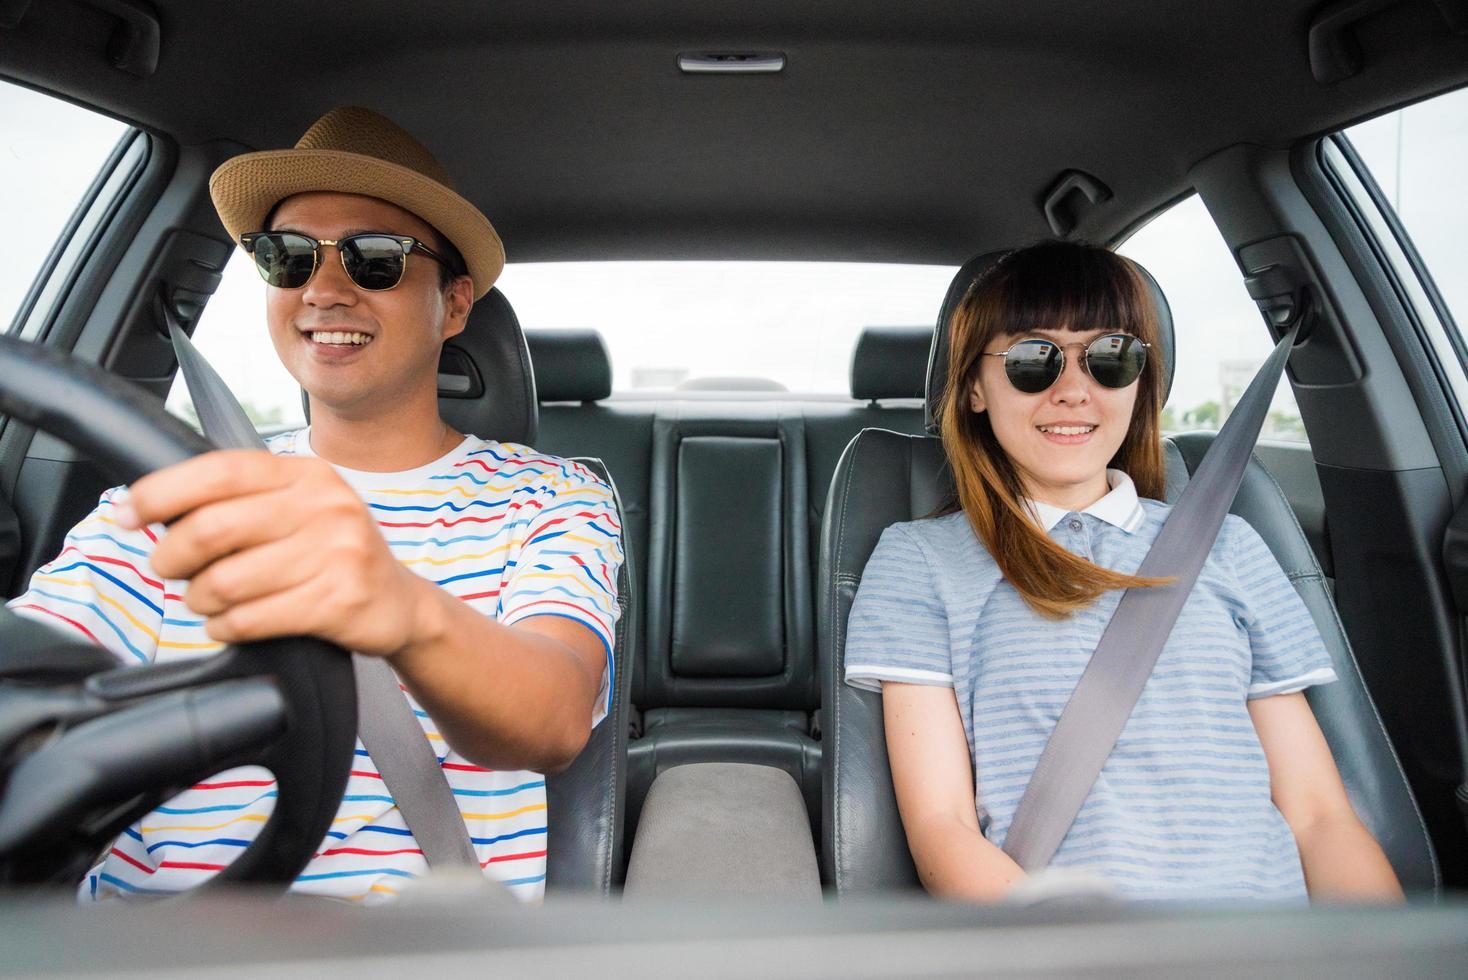 Man and woman having fun while driving photo